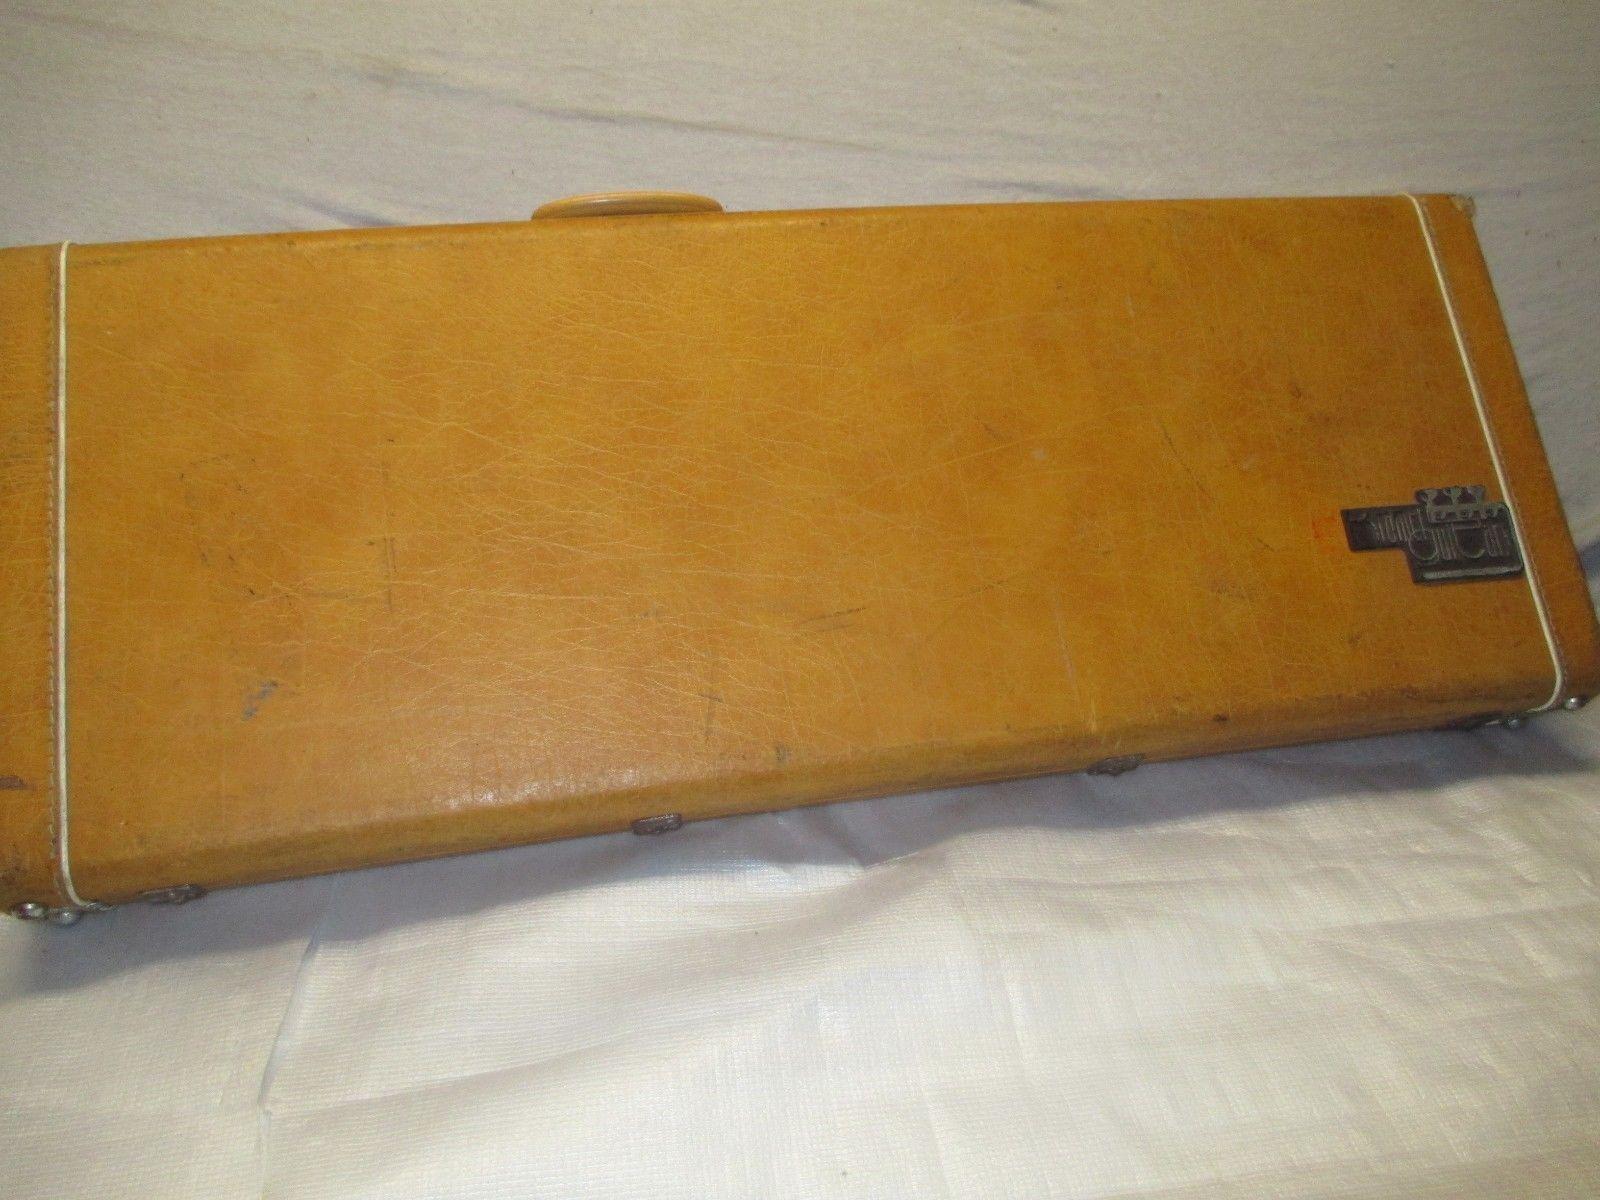 1979 KRAMER DMZ 1000 GUITAR CASE - made in USA